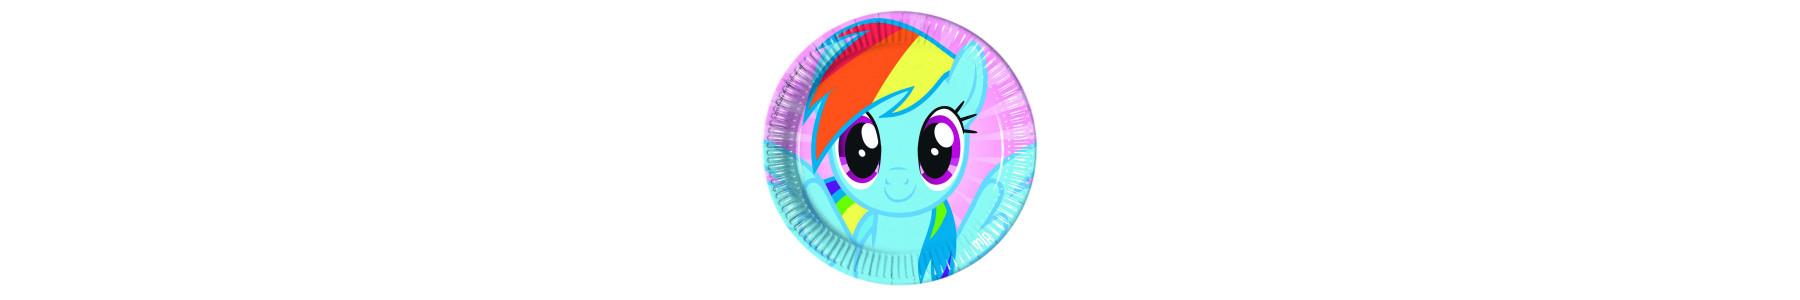 Articole de petrecere Pony Rainbow